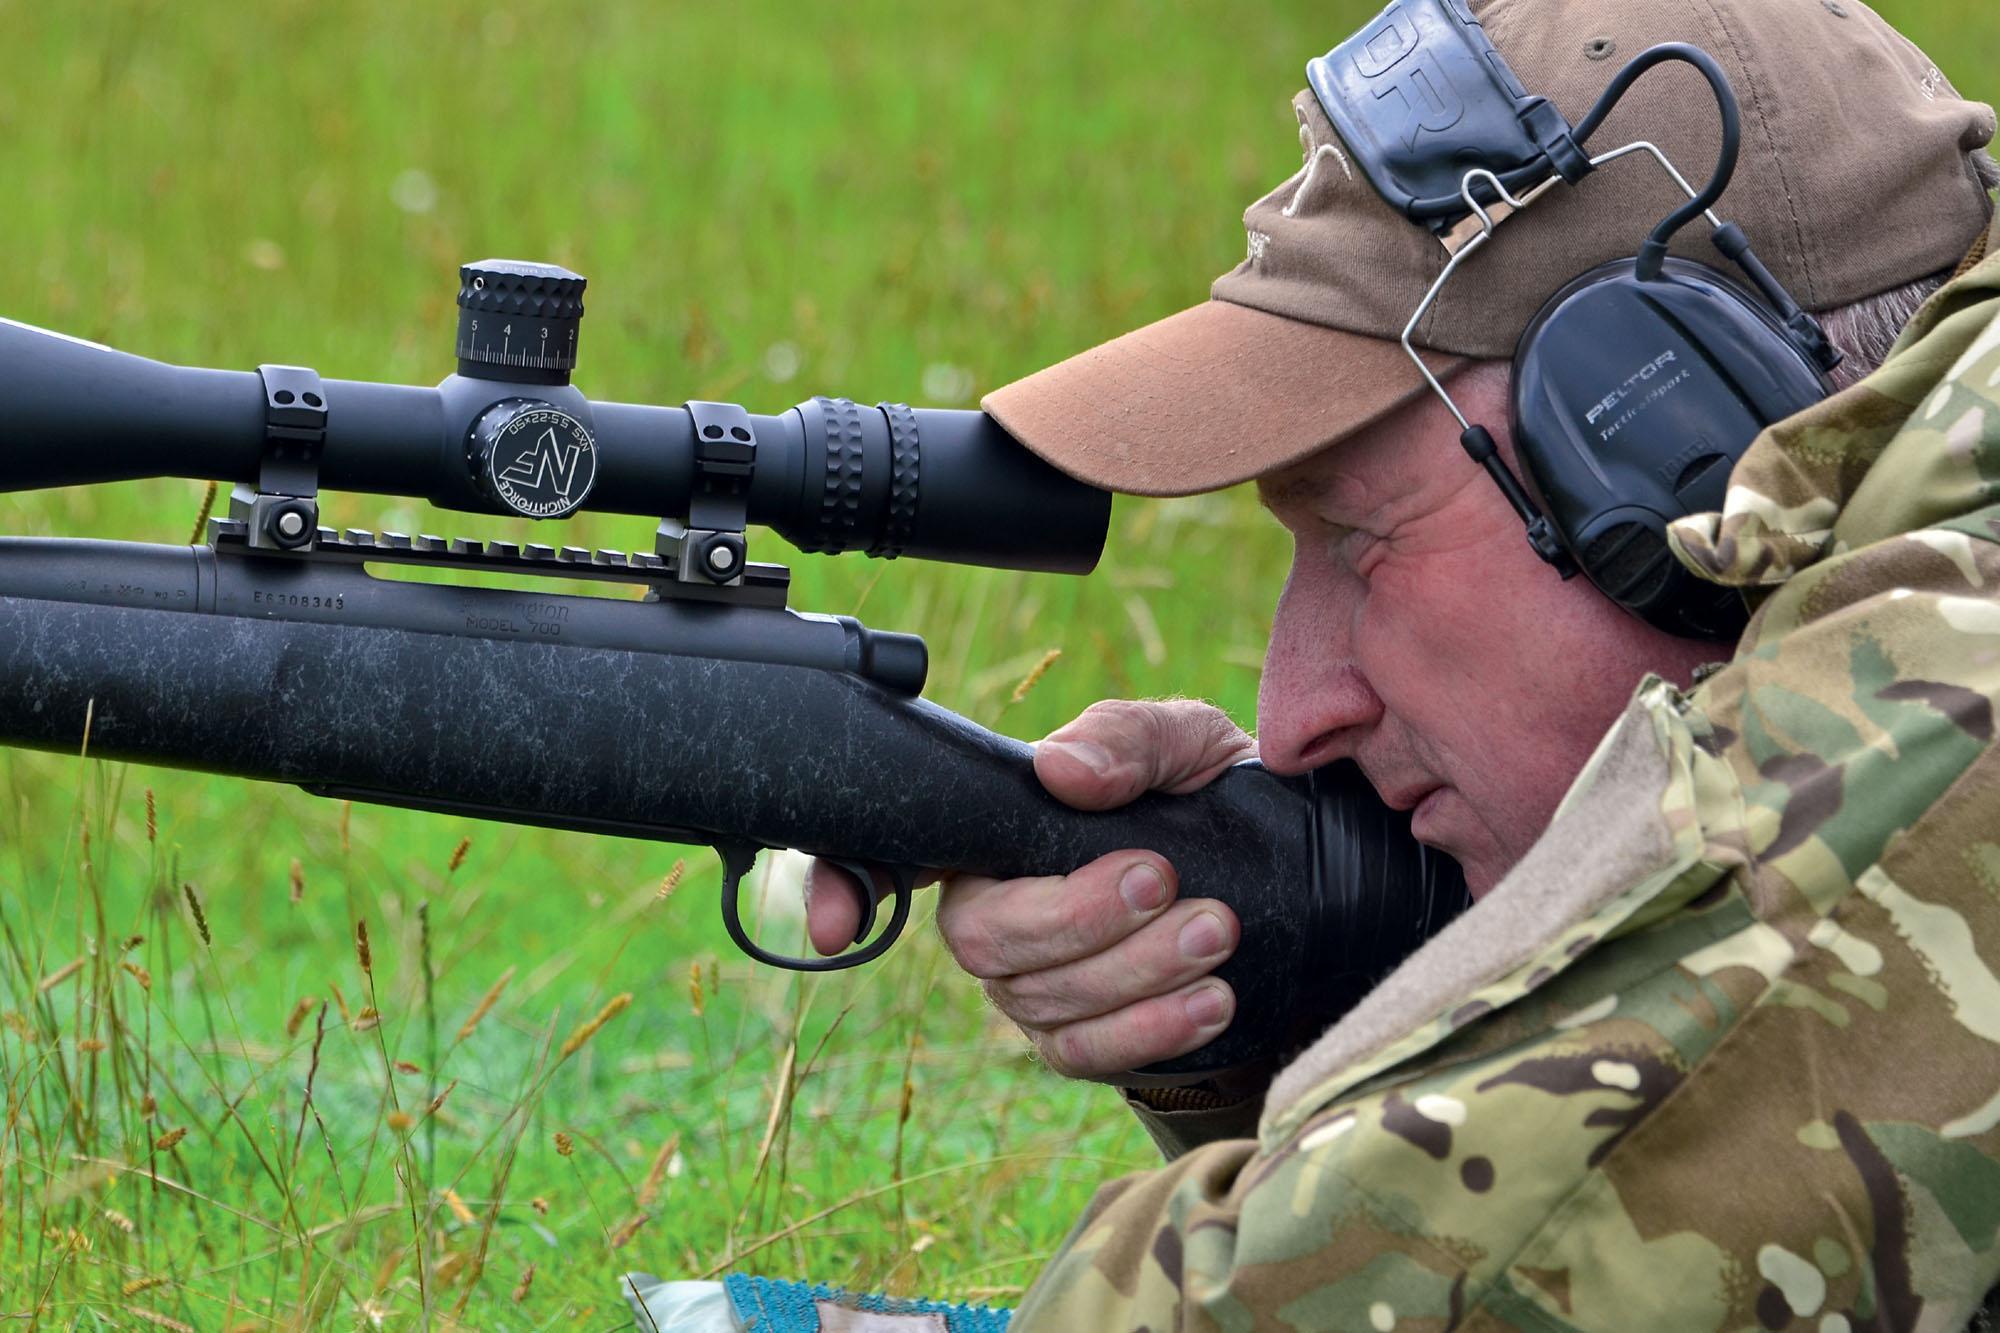 Laser Entfernungsmesser Long Range : Long range zeitschrift visier all shooters